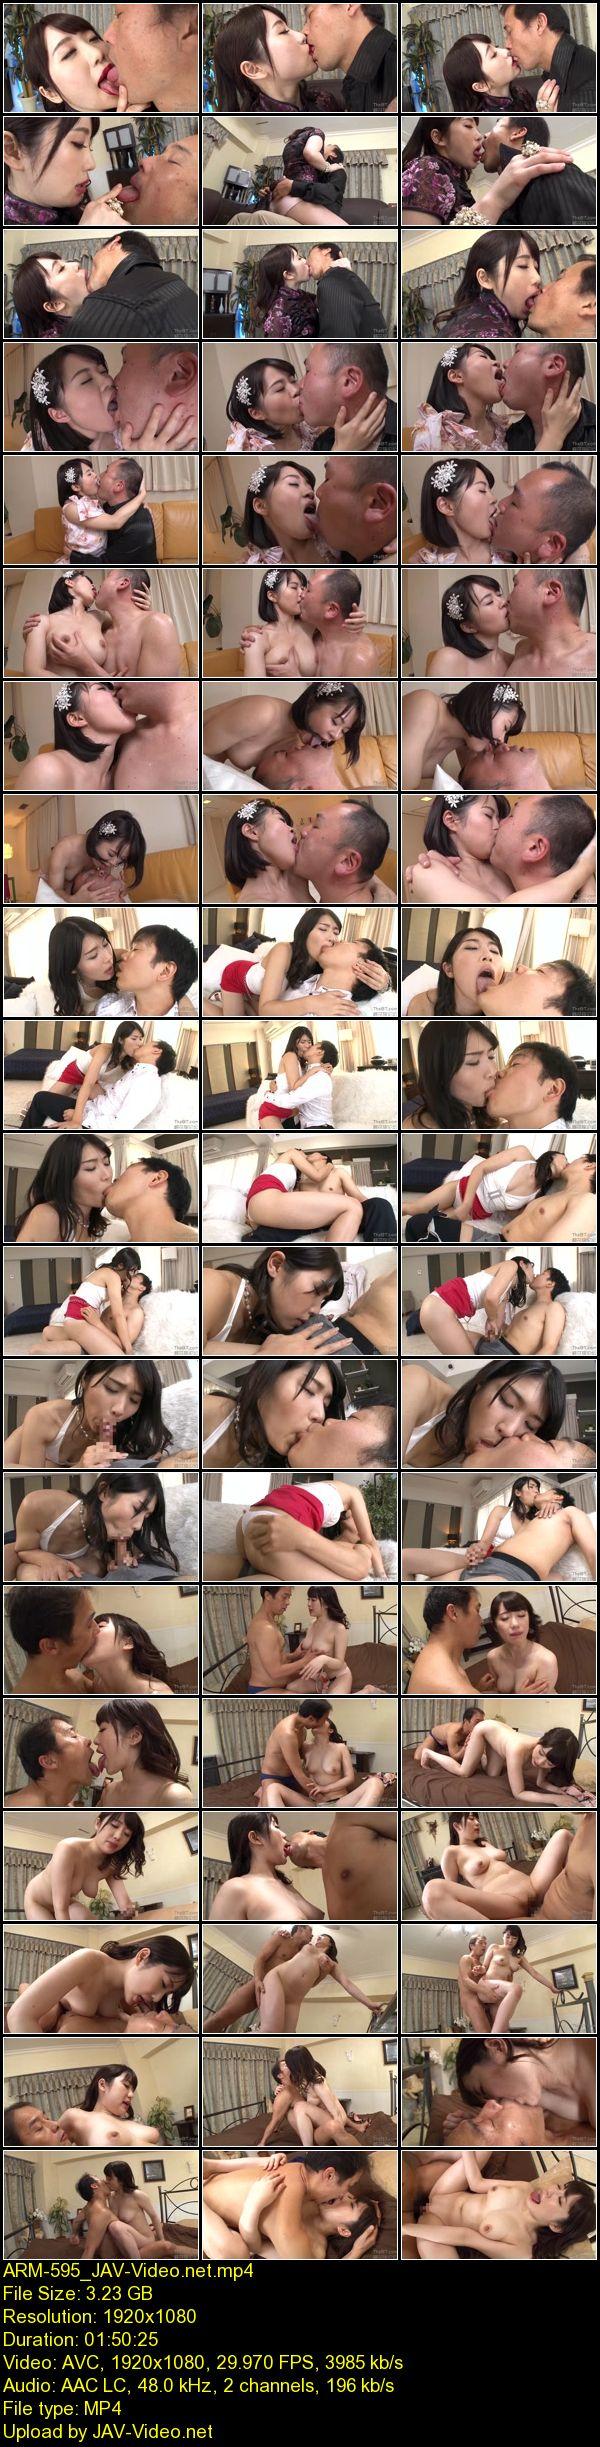 JAV Download [ARM 595] 接吻サロン・オムニバス 女優 アロマ企画 2017 04 13